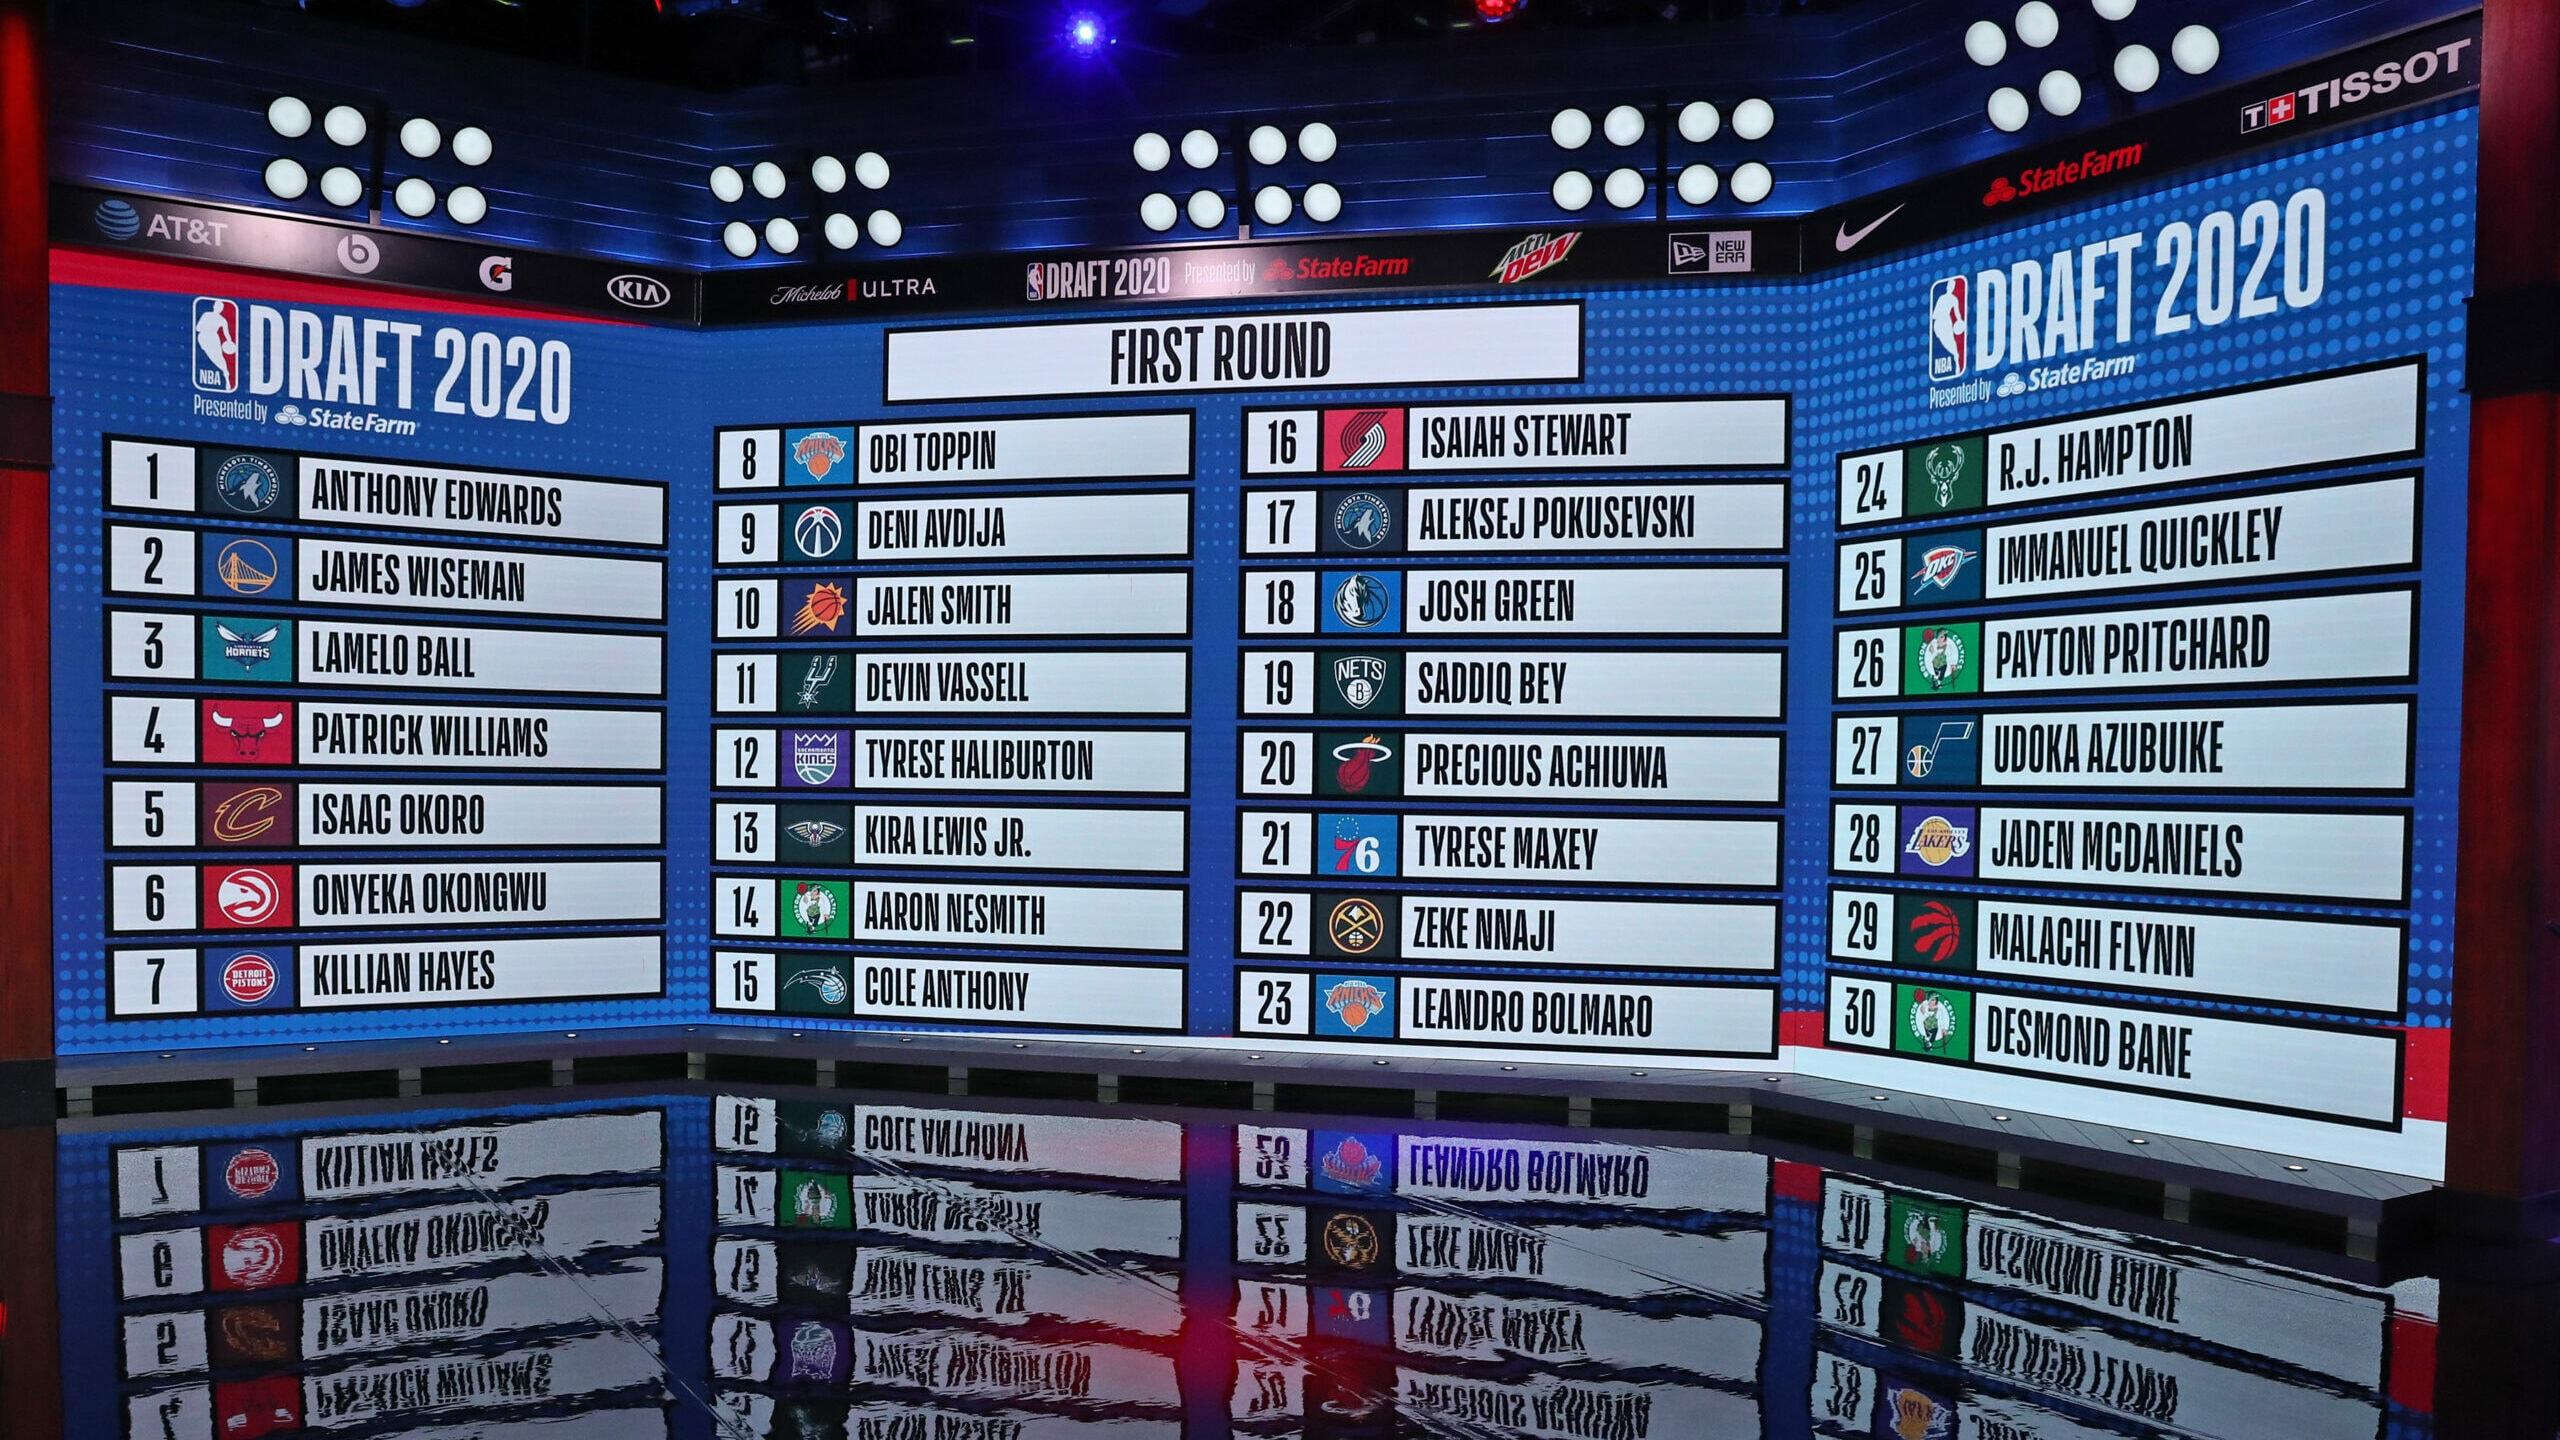 2020 Nba Draft   NBA.com